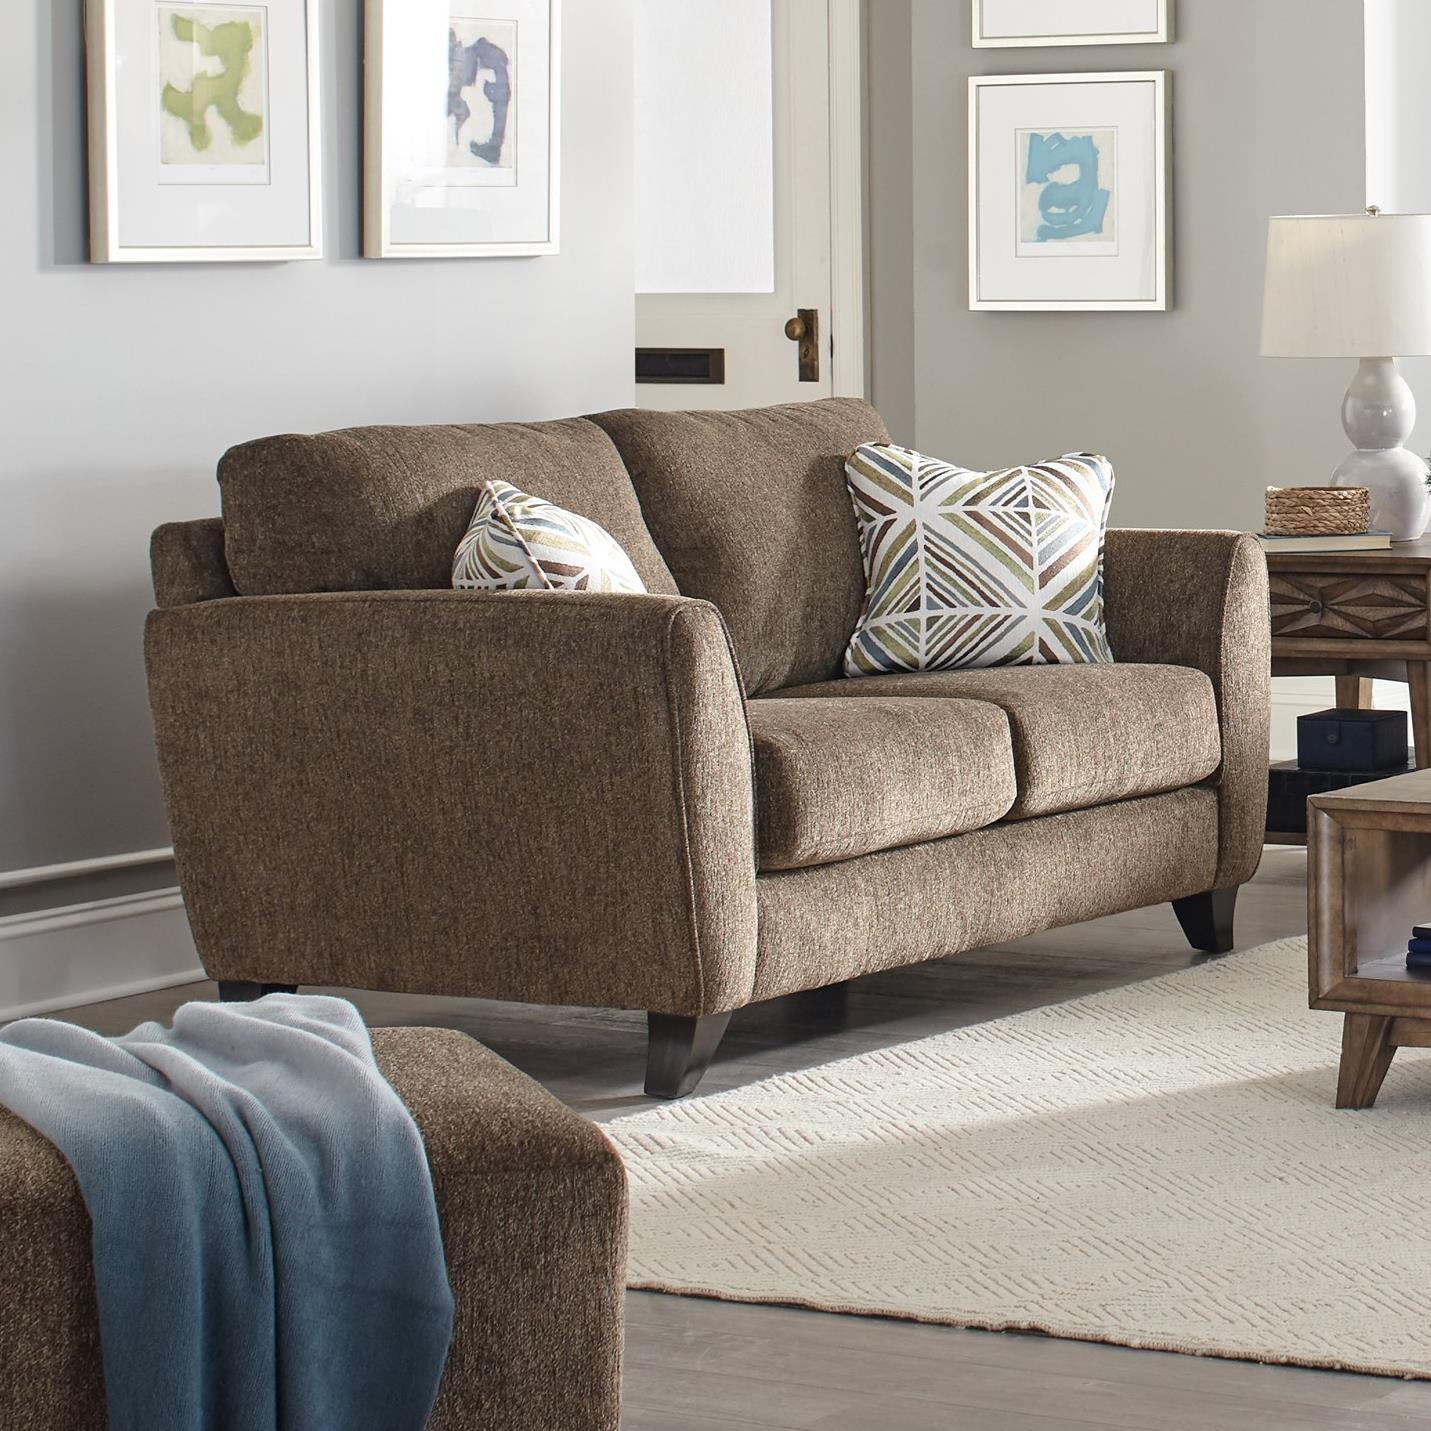 Alyssa Loveseat by Jackson Furniture at Standard Furniture